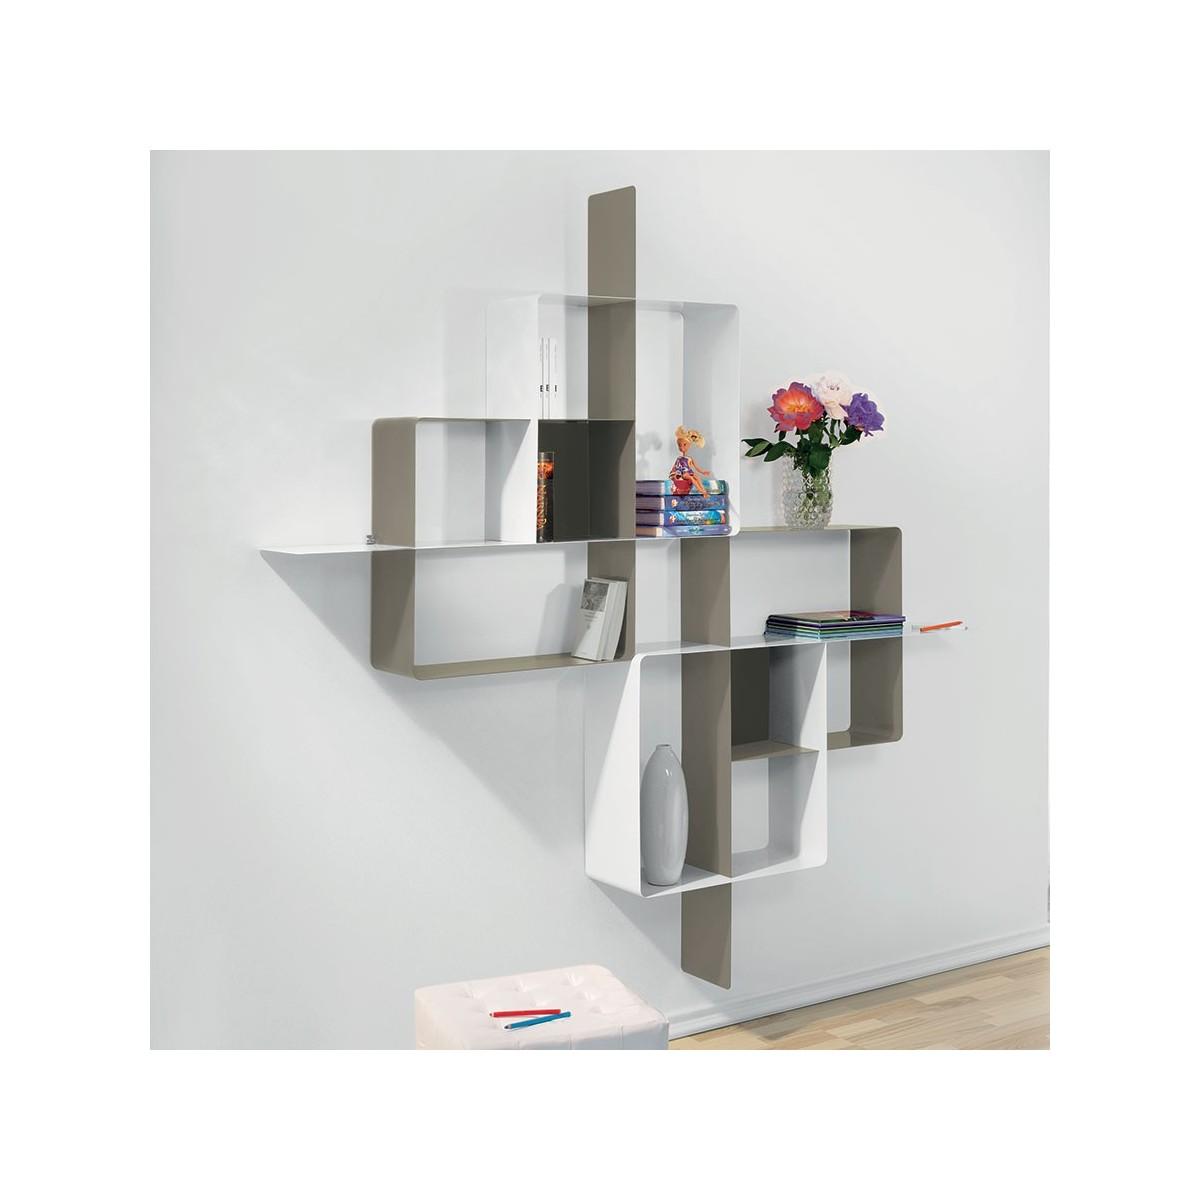 Libreria scaffalatura in acciaio tortora bianco mondrian 5 - Libreria a parete ...